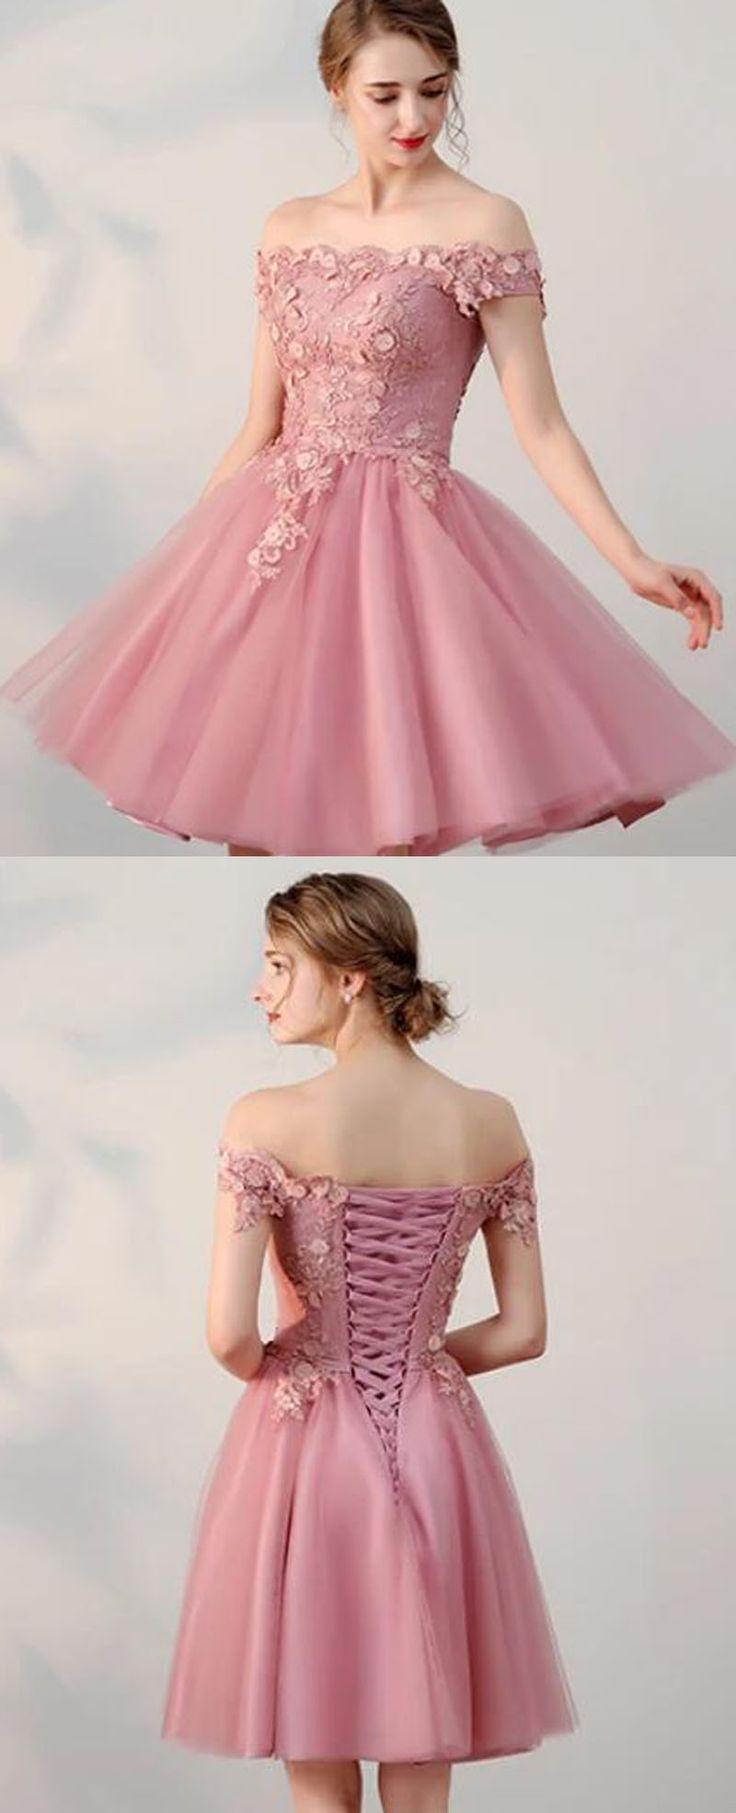 Charming short prom dress dusty pink junior